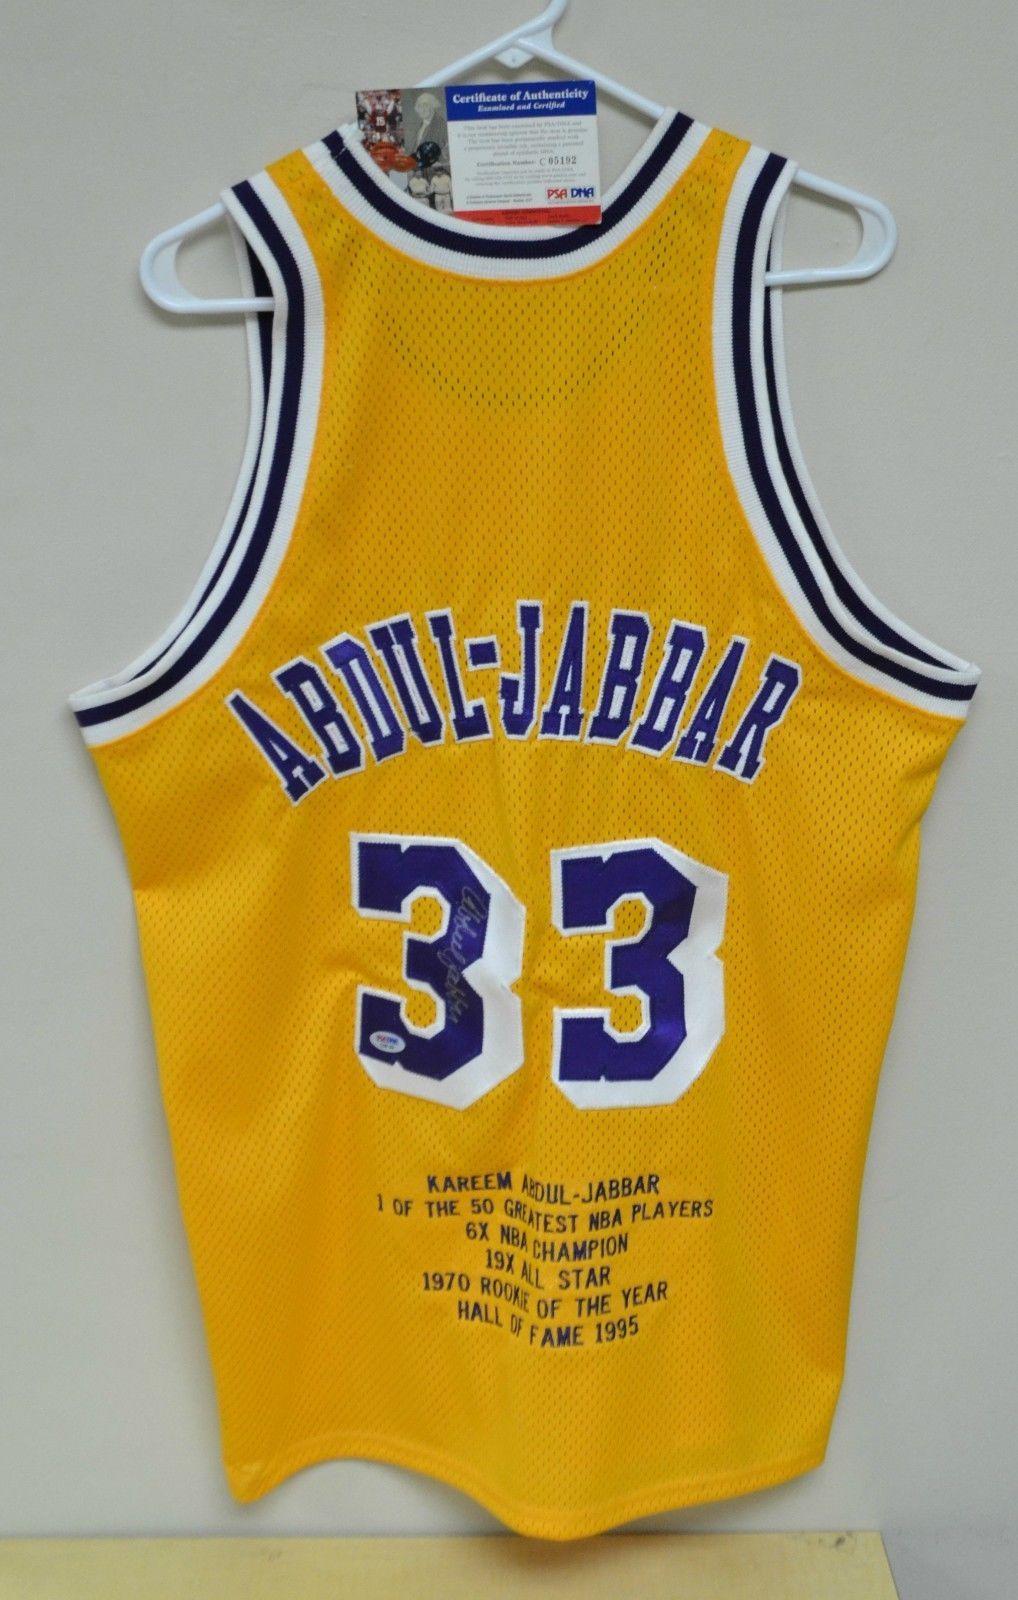 Kareem Abdul-Jabbar Autographed Career Highlight Lakers Jersey w PSA DNA  COA (eBay Link) 56e1395ae